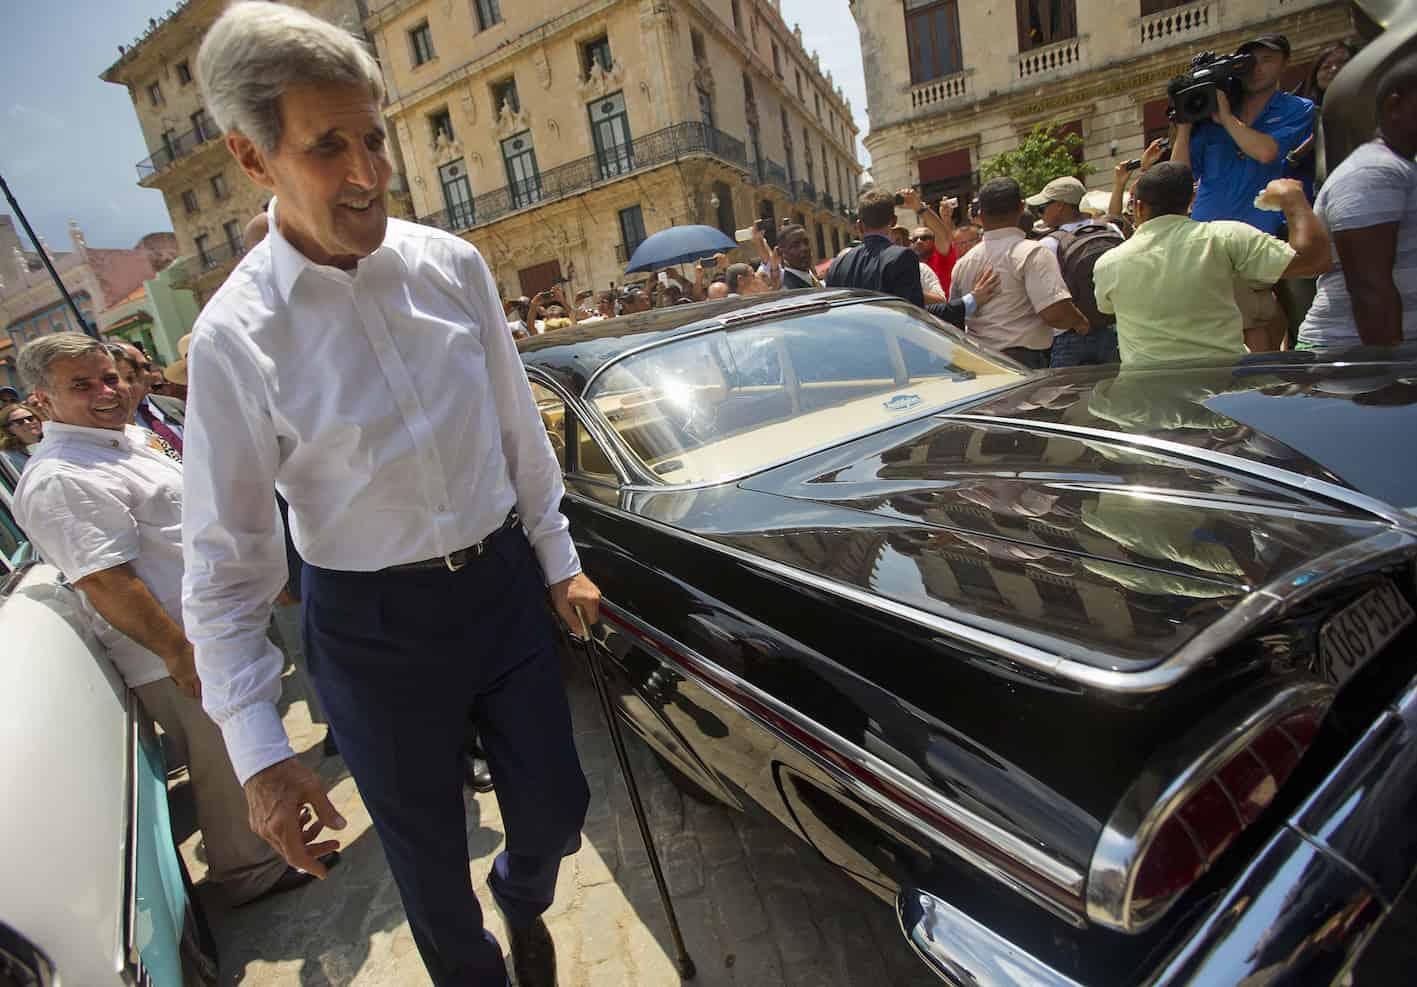 U.S. Secretary of State John Kerry in Cuba | US Cuba relations